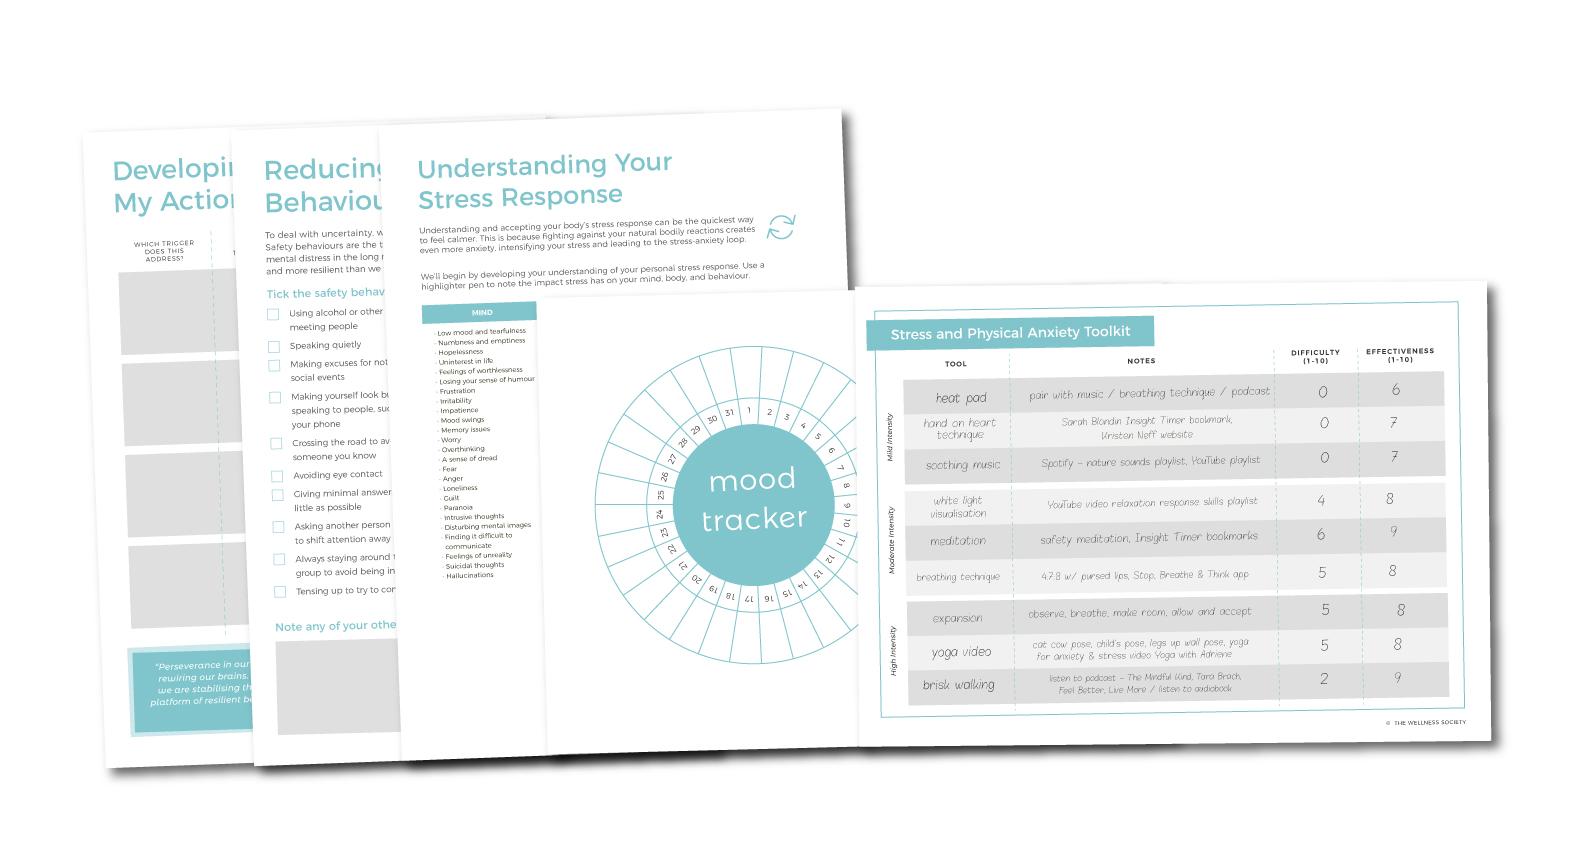 Identifying Cognitive Distortions Worksheet